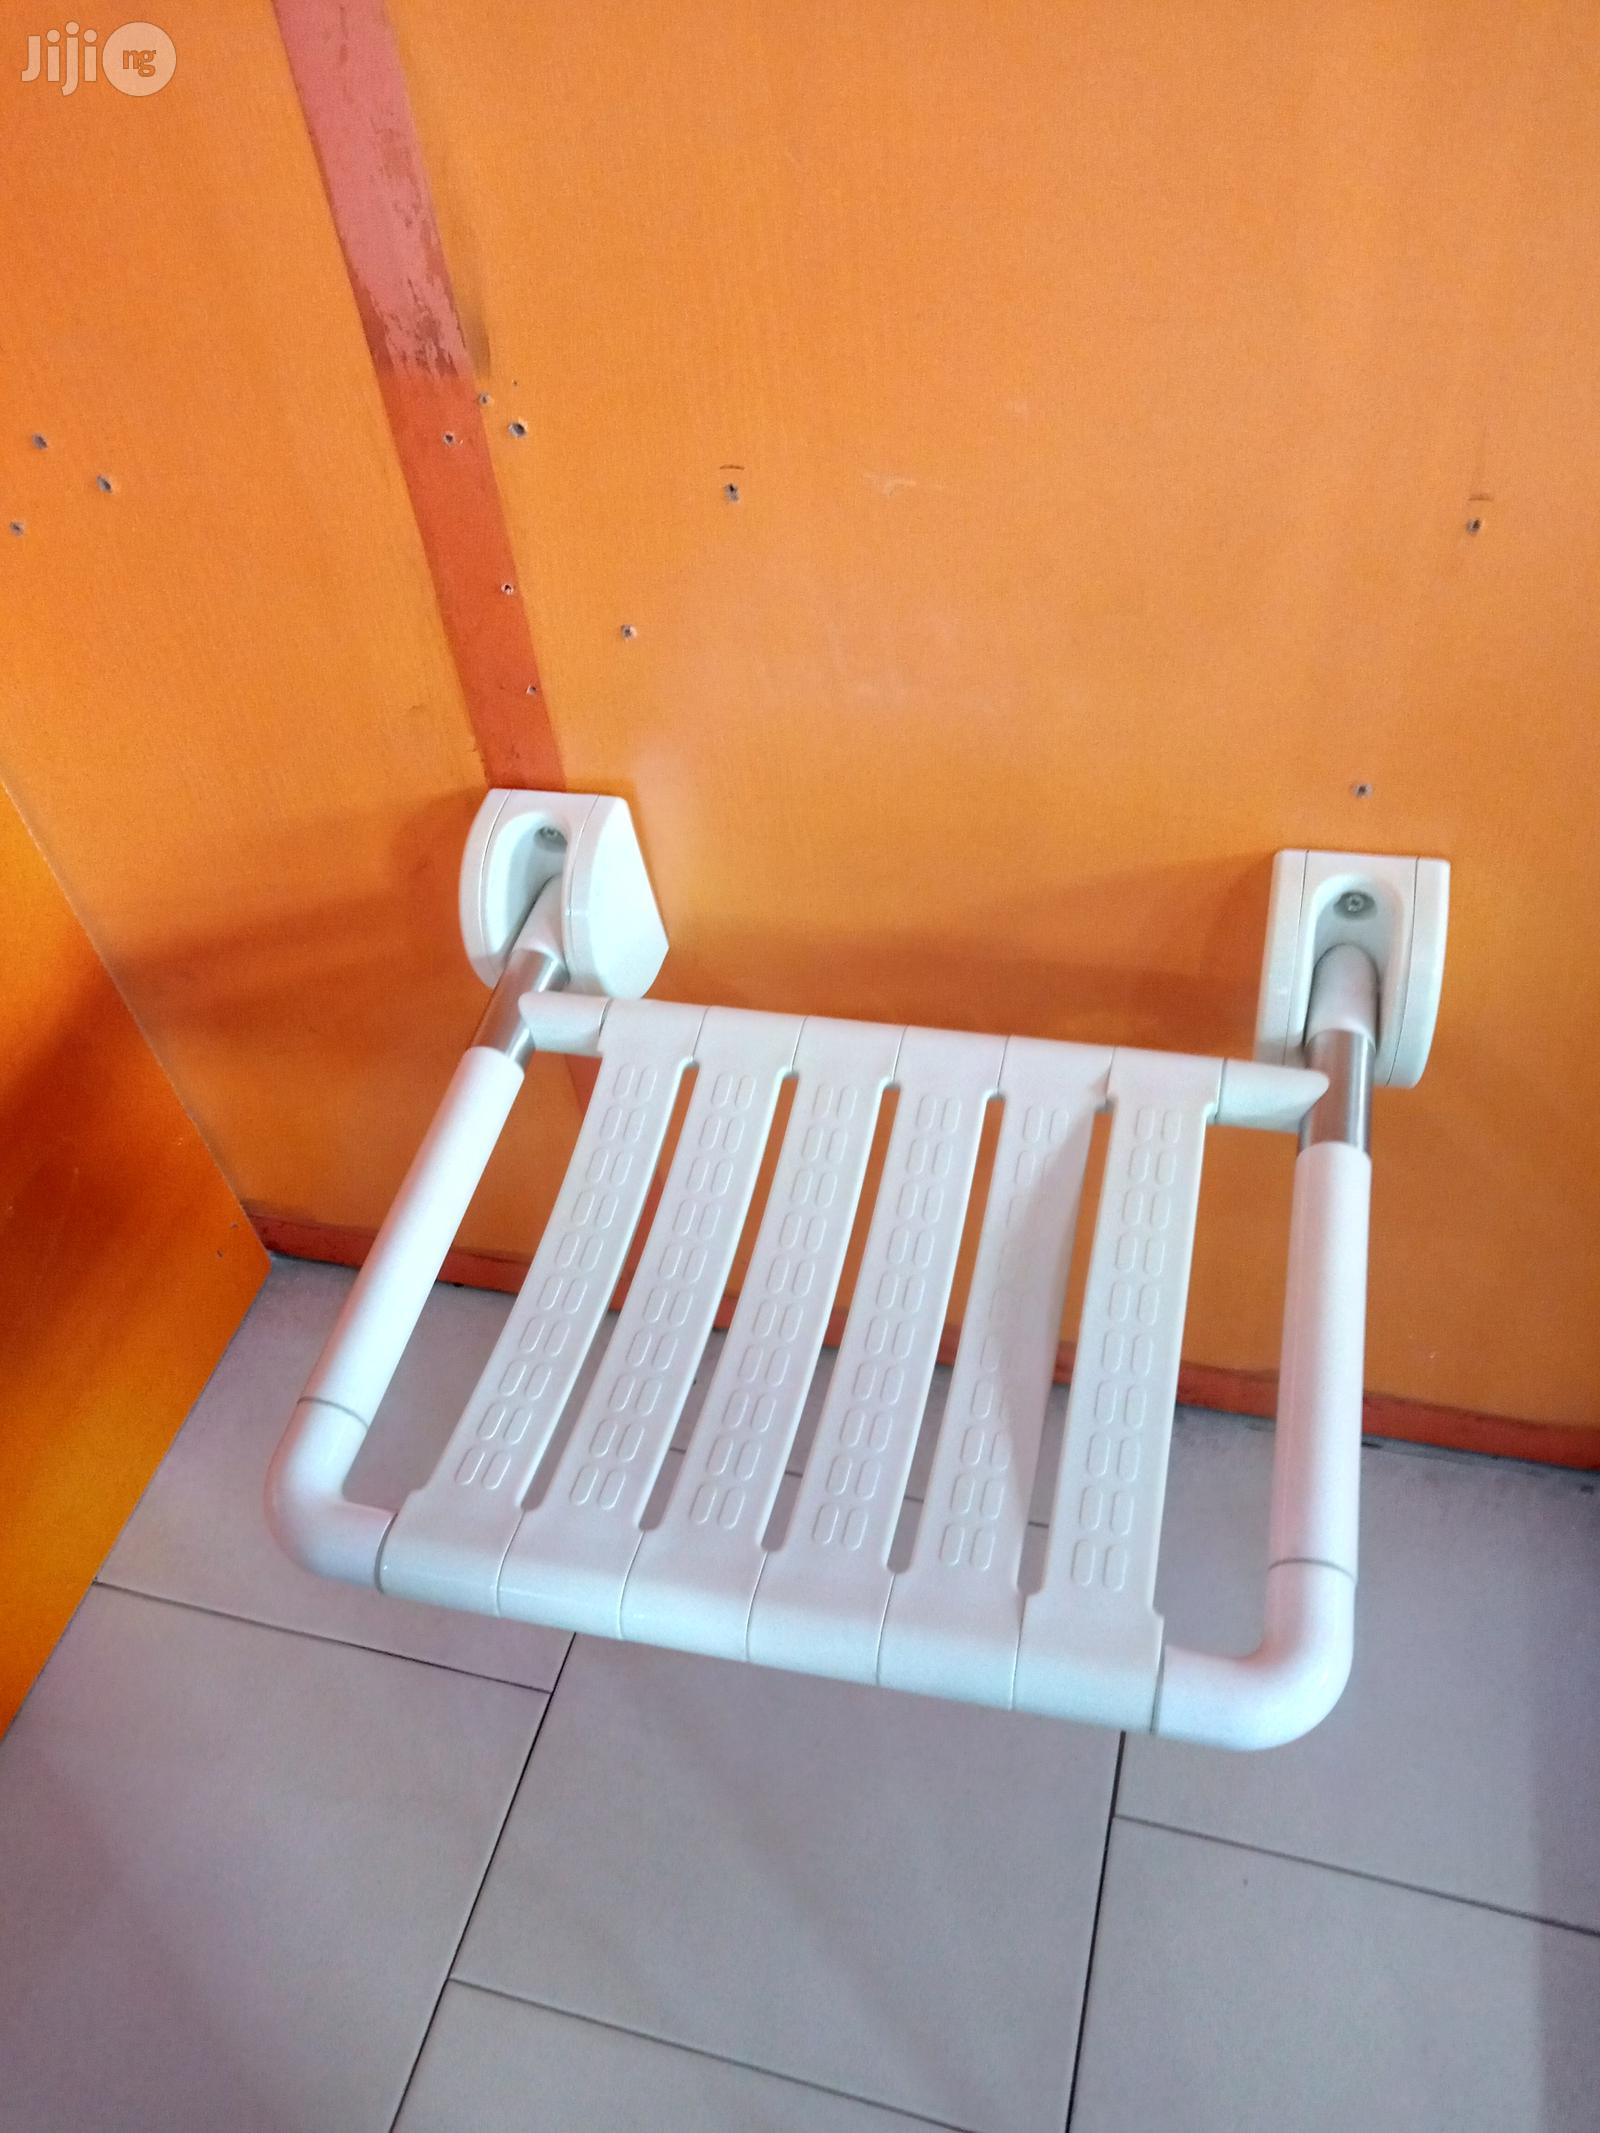 Adjustable Shower Seat (Original UK)